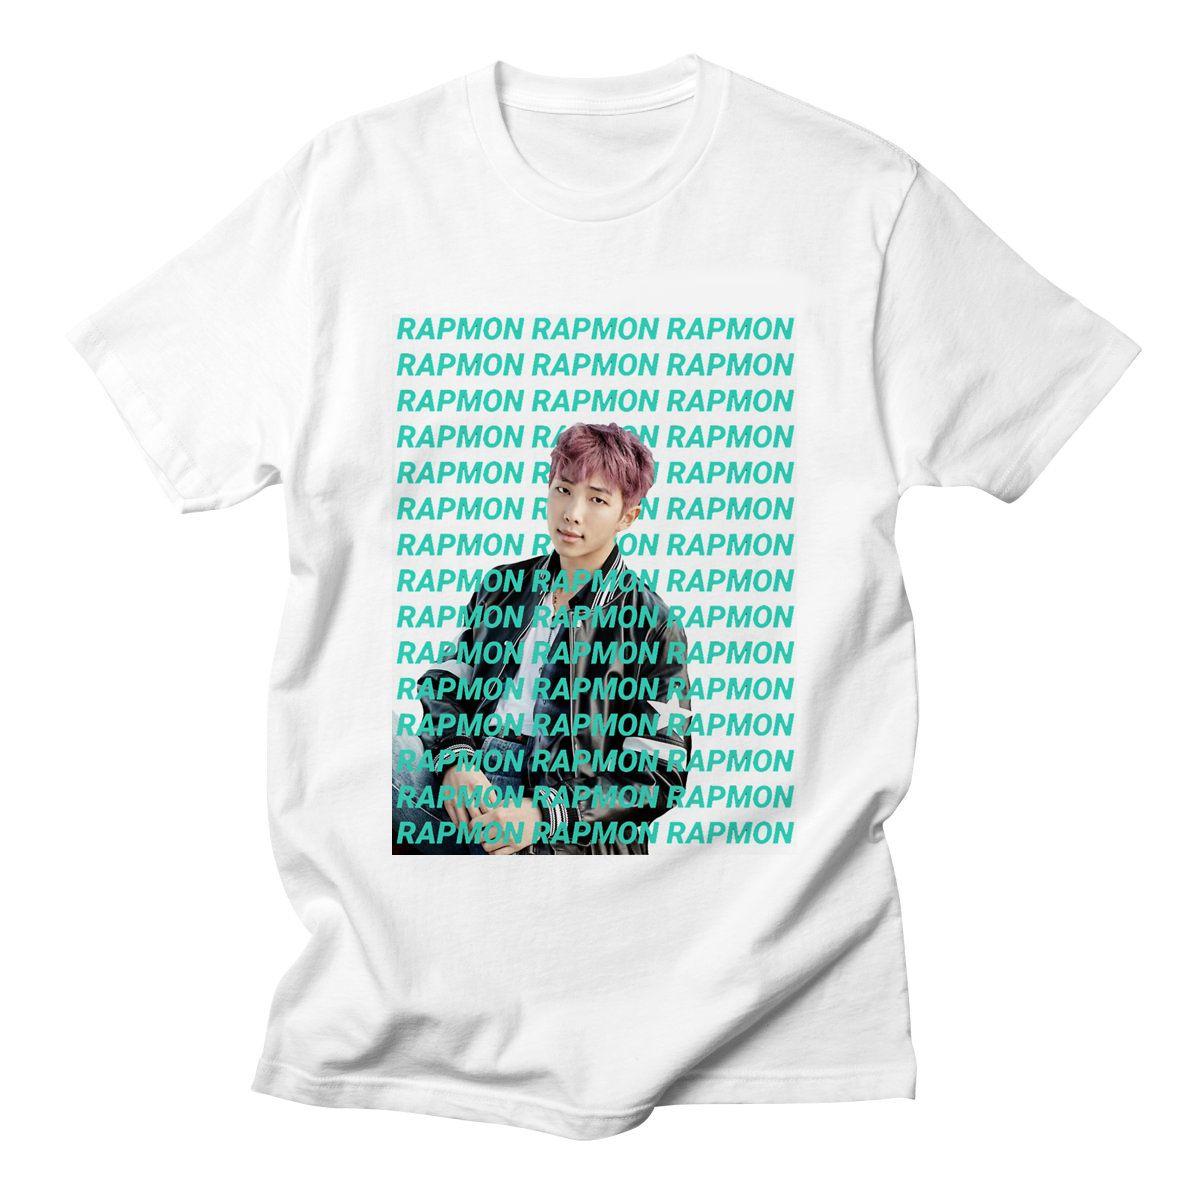 Compre Camiseta De Mujer Lettbao Bts Camiseta Mujer Camisetas Bangtan Boys  Kpop Camiseta Algodón Moda De Verano Hip Hop Ropa Harajuku Camisa A  23.95  Del ... b600cd319d1